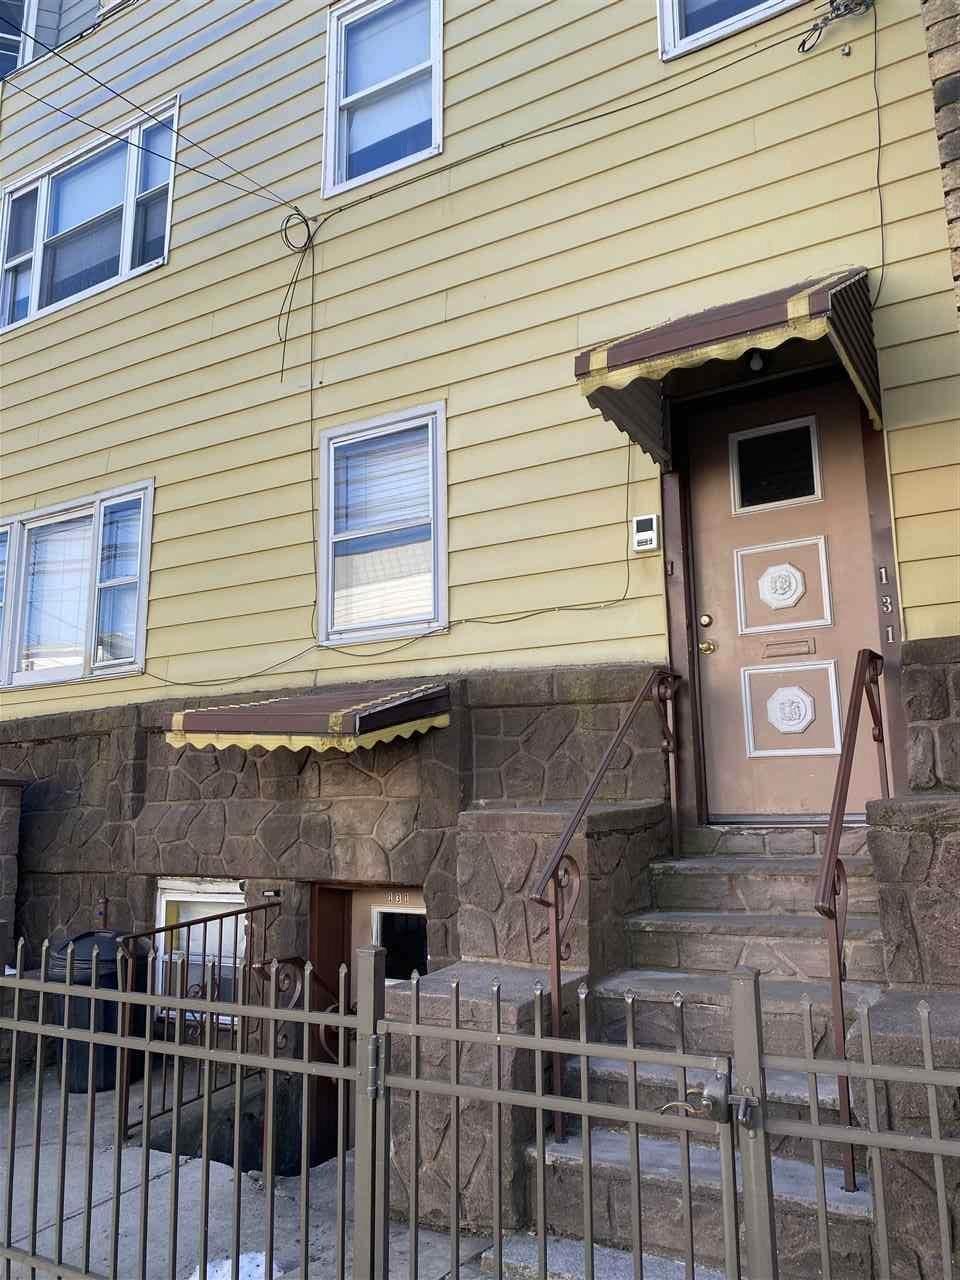 131 Hopkins Ave - Photo 1